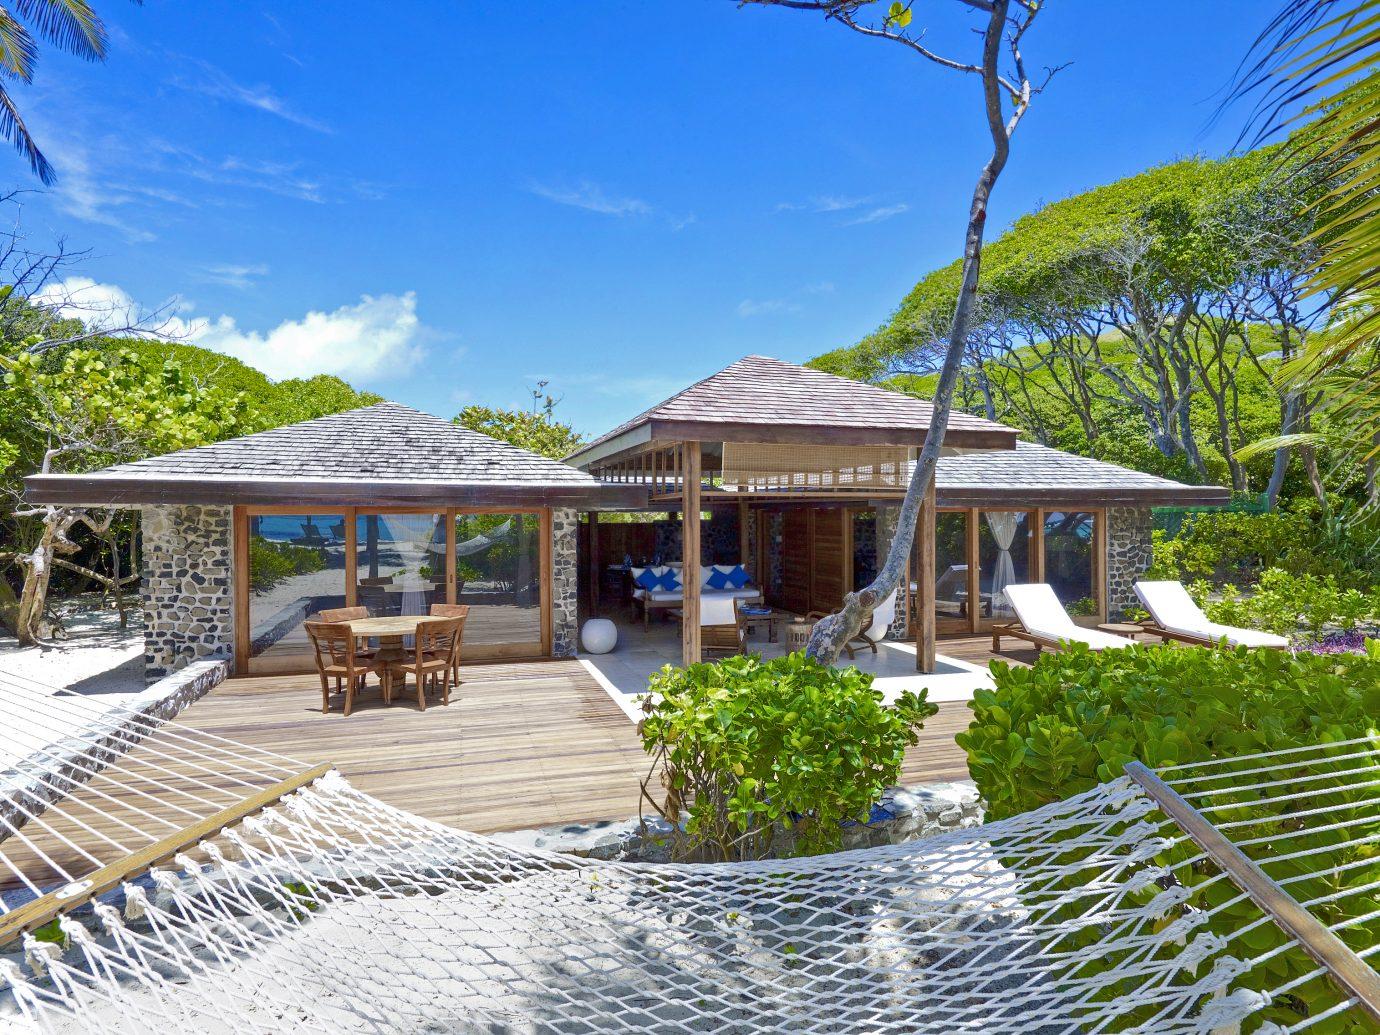 Exterior and hammock at Petit St Vincent Resort